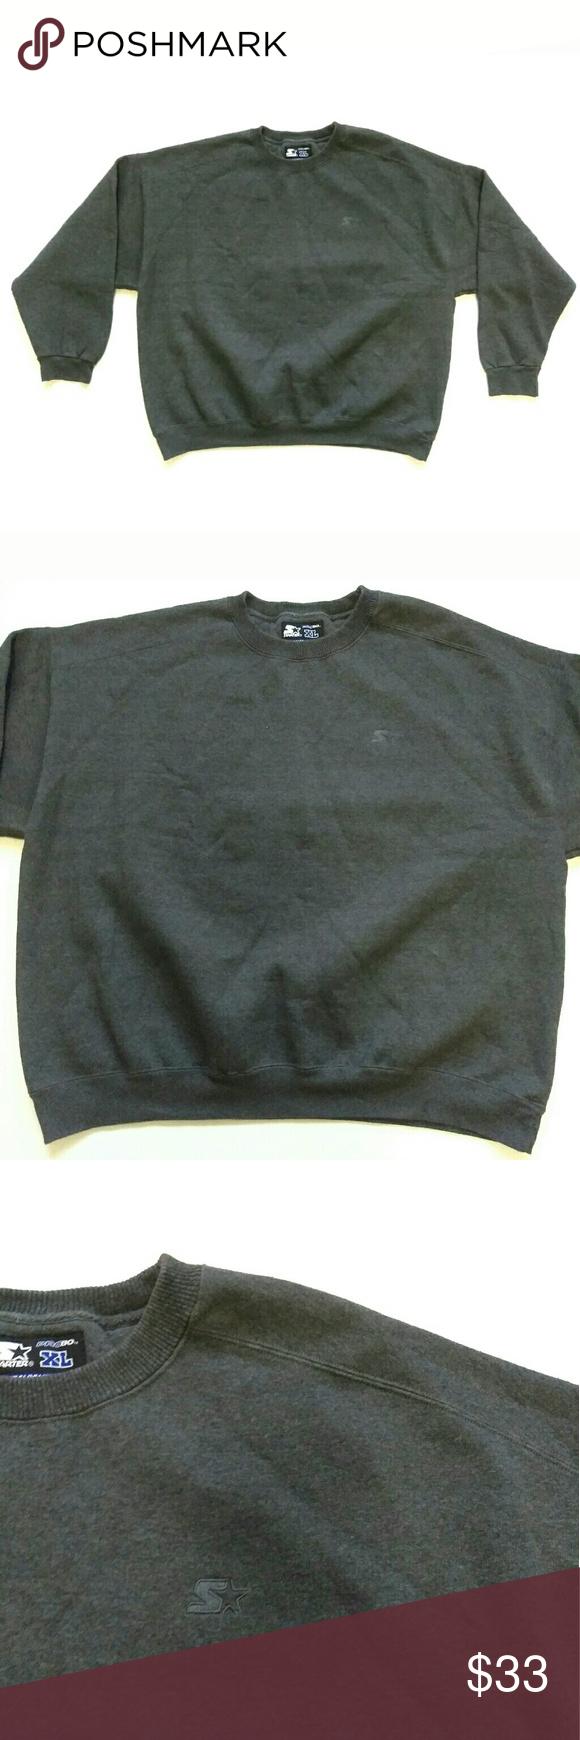 Starter Pro80 Heavyweight Crewneck Sweatshirt You Are Buying Vintage Starter Pro80 Heavyweight C Pullover Sweater Sweatshirts Sweatshirts Crew Neck Sweatshirt [ 1740 x 580 Pixel ]